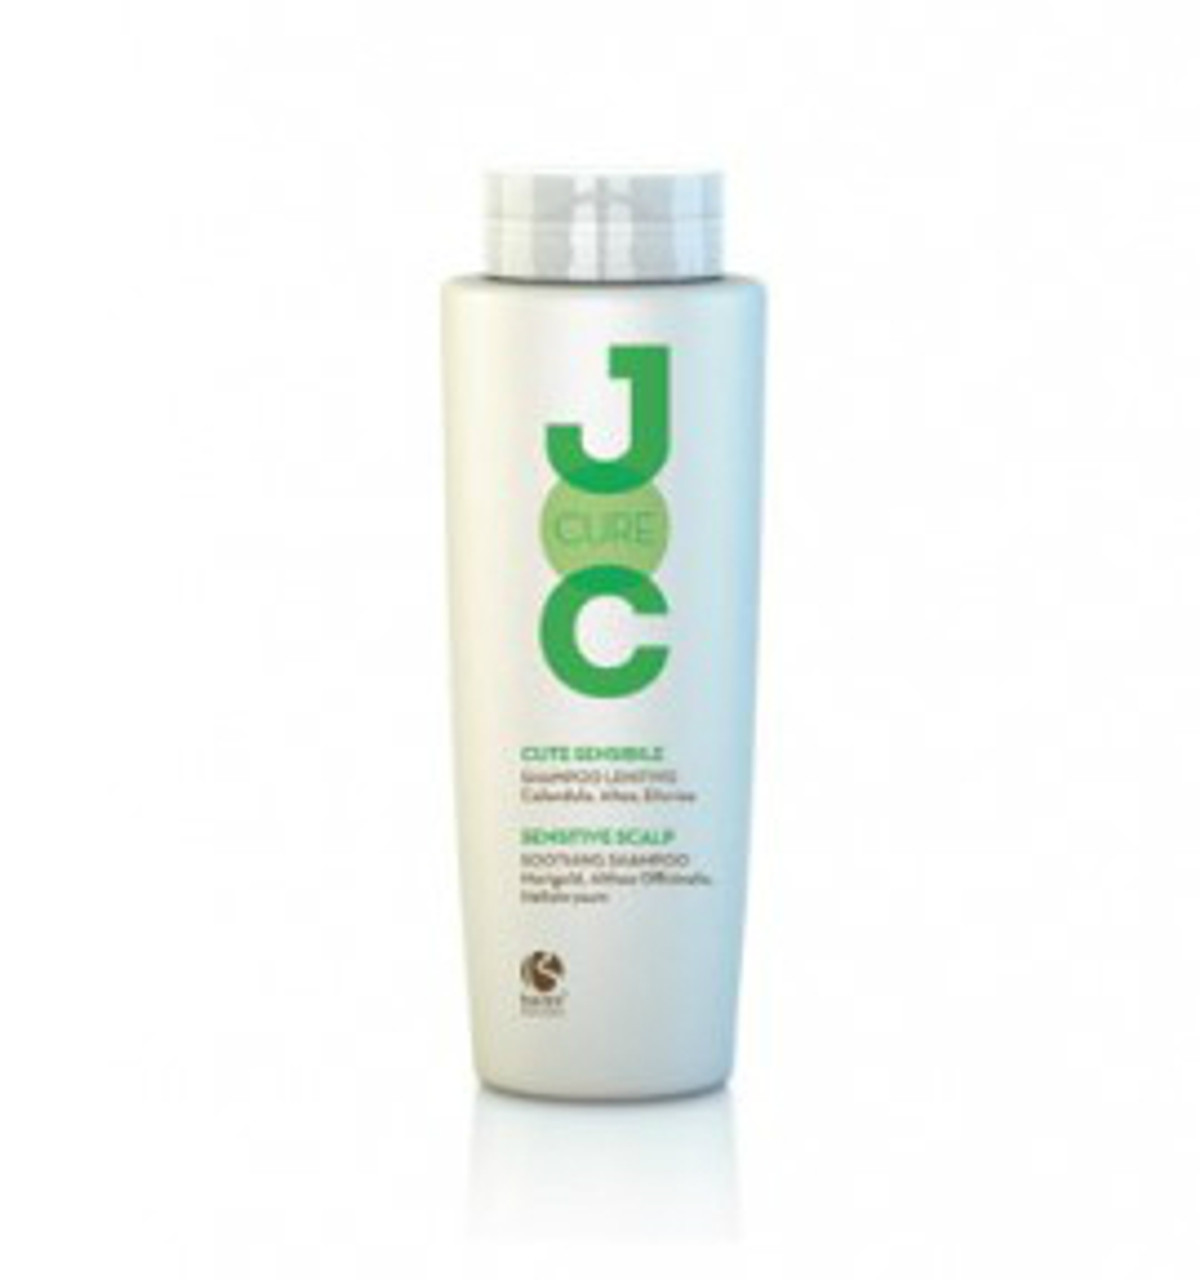 Barex Italiana JOC Soothing Shampoo, 8.5 fl oz (250 ml)